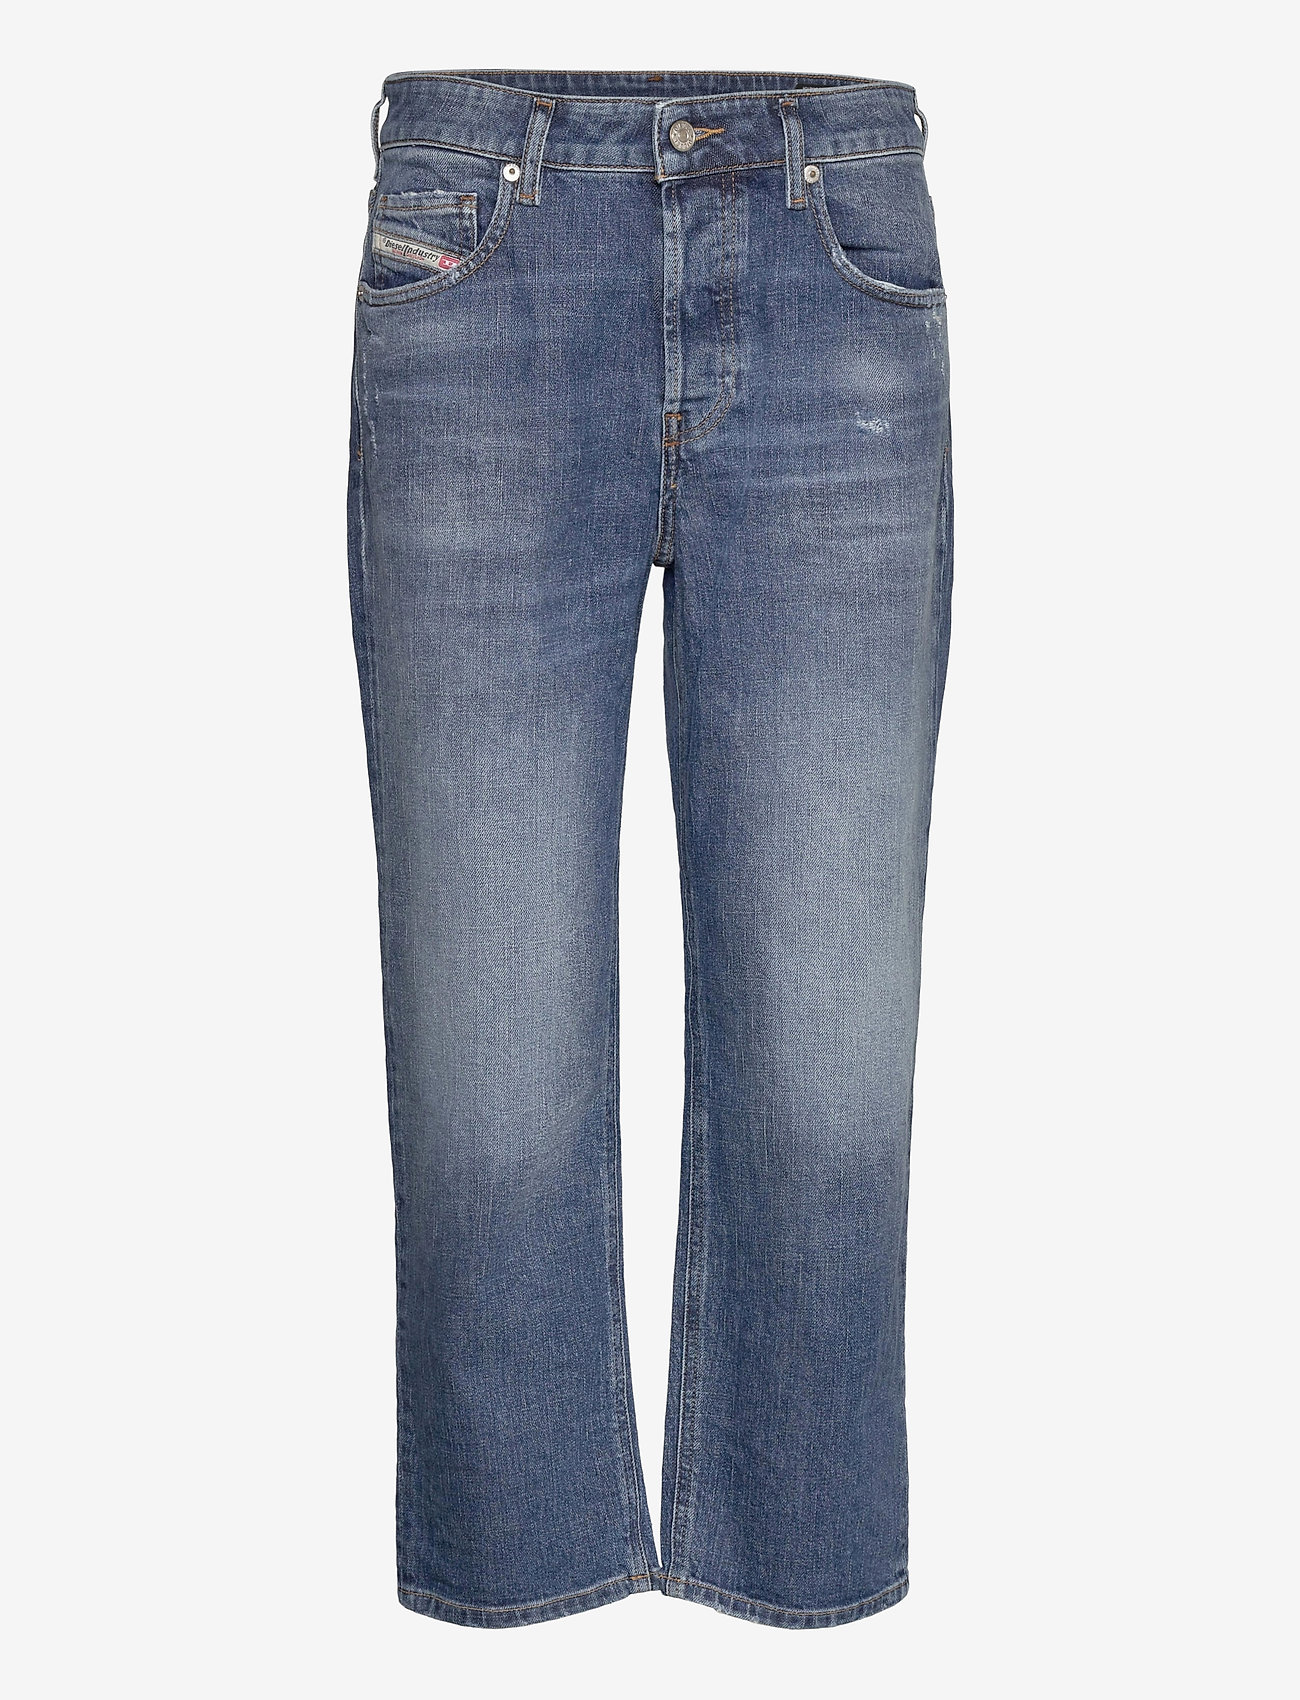 Diesel Women - D-ARYEL  L.32 TROUSERS - straight jeans - denim - 0